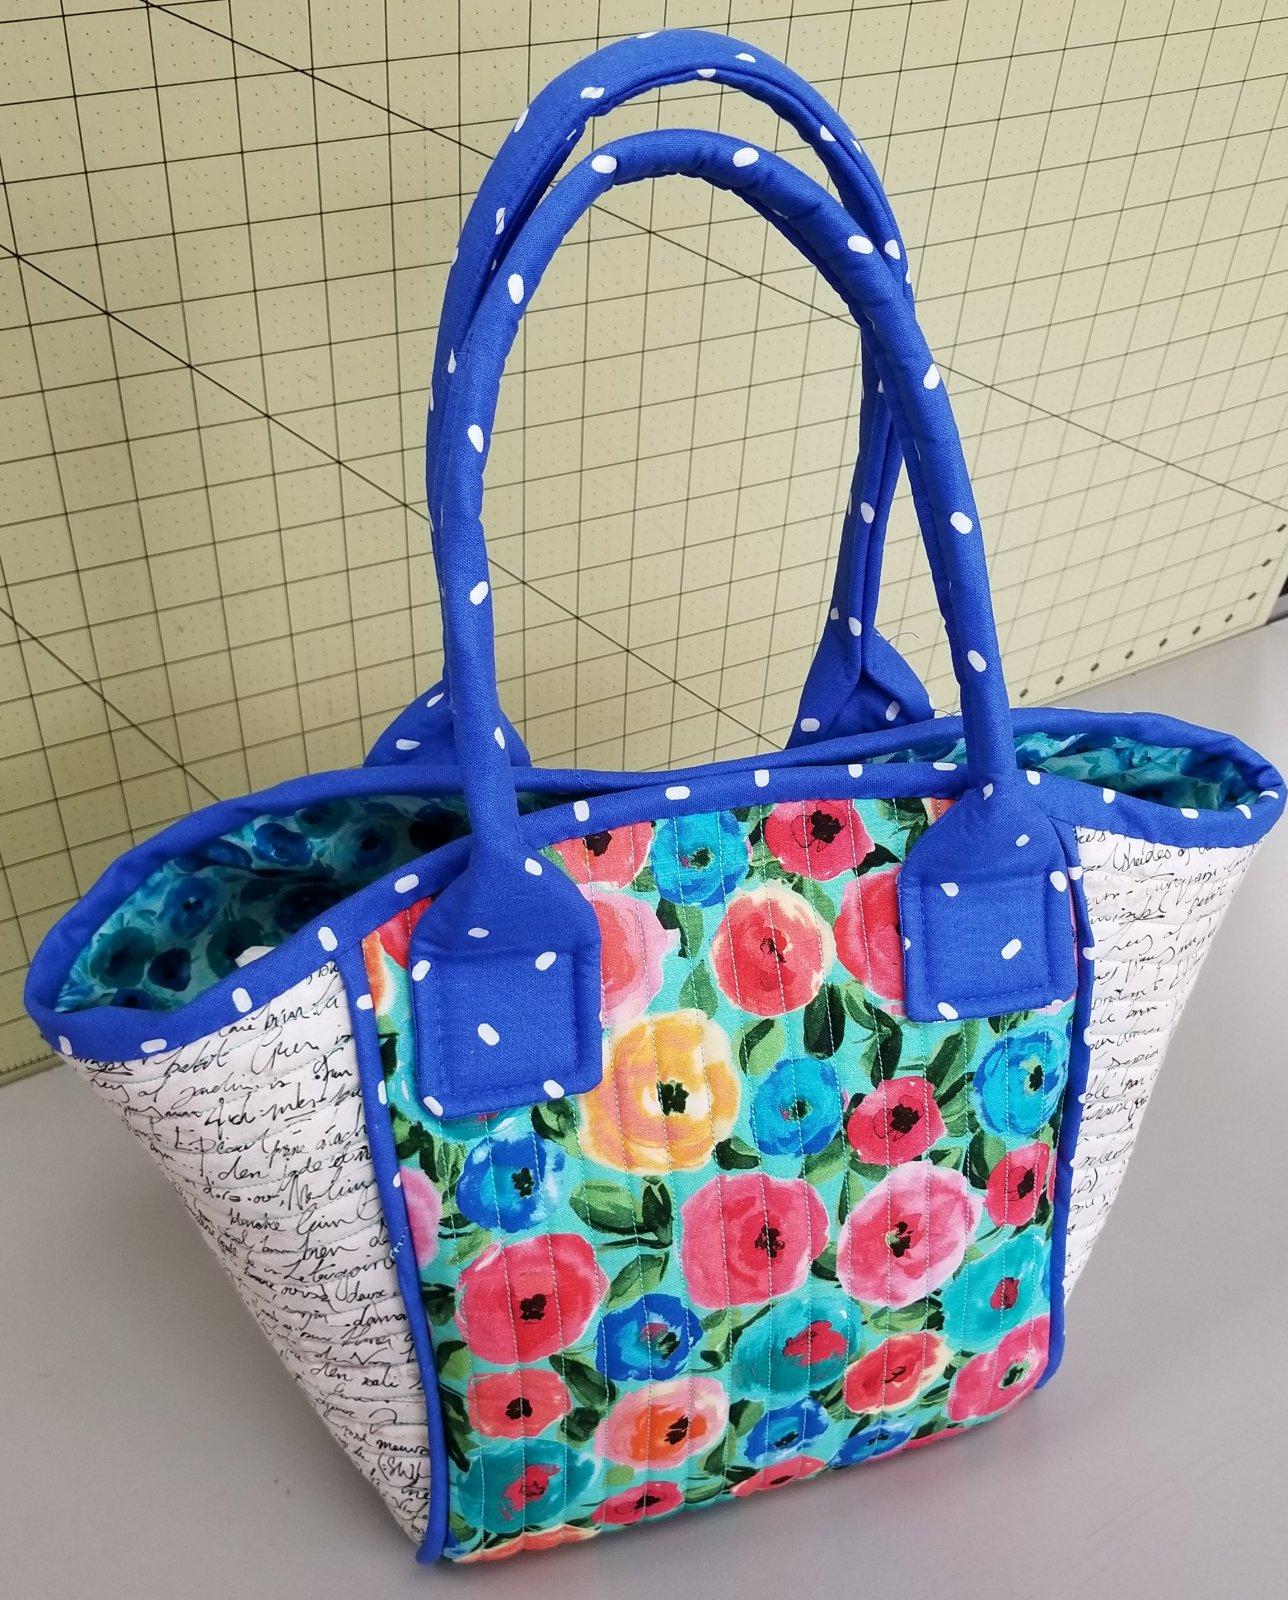 Floral Basket Tote